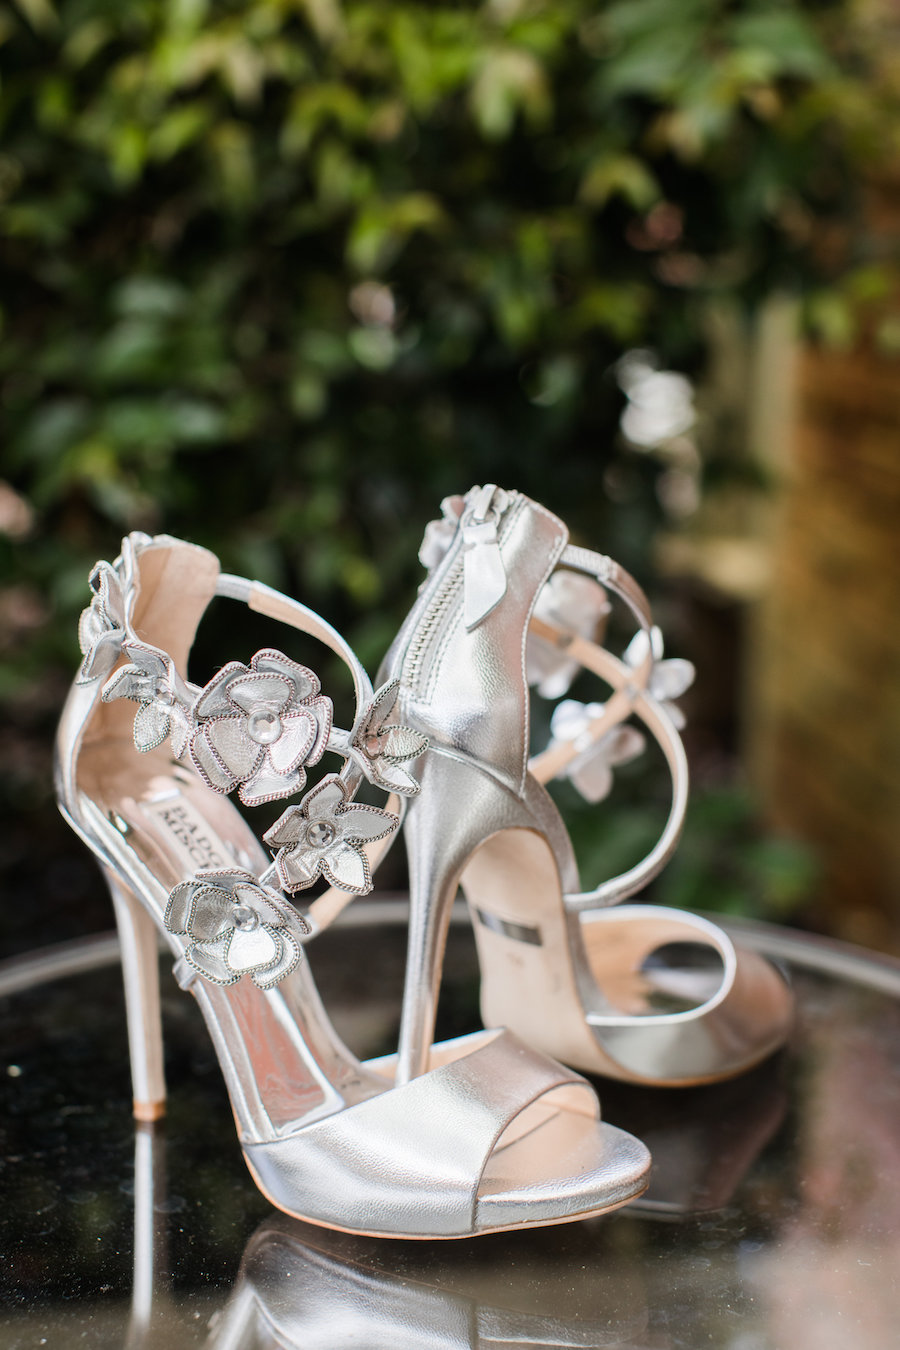 roque-events-marissa-rob-wedding-brooke-beasley-photography-getting-ready3.jpg